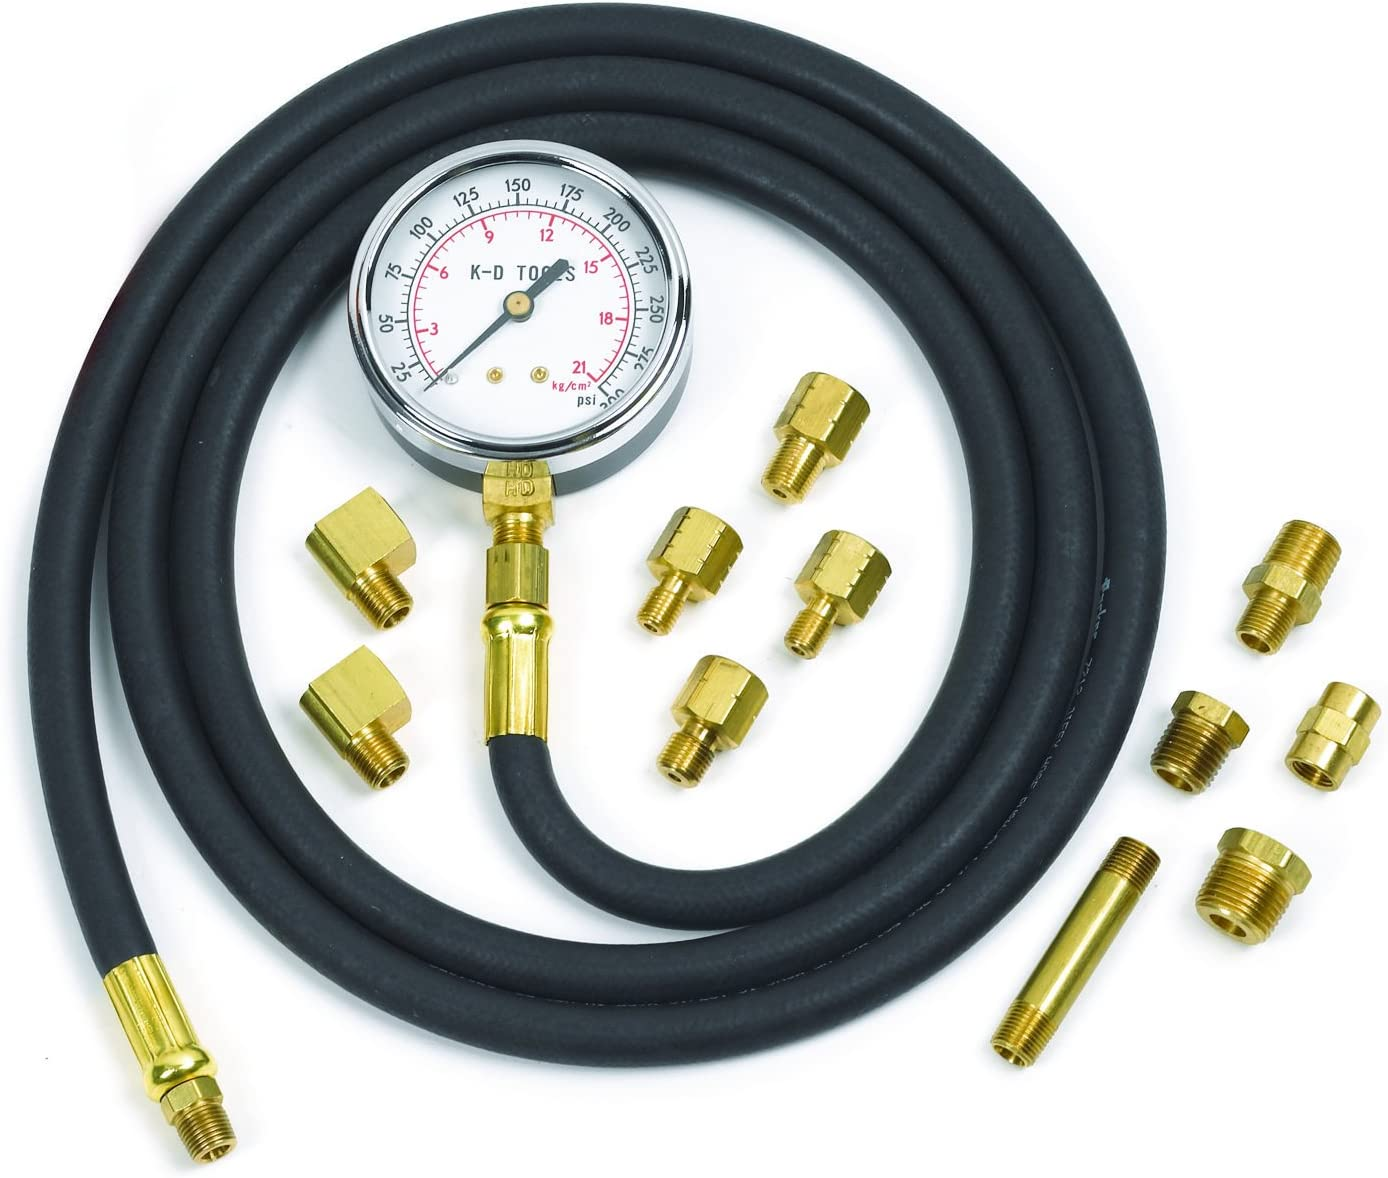 12 Pcs Automatica Transmision Probador De Presion Del Motor Kit De Diagnostico